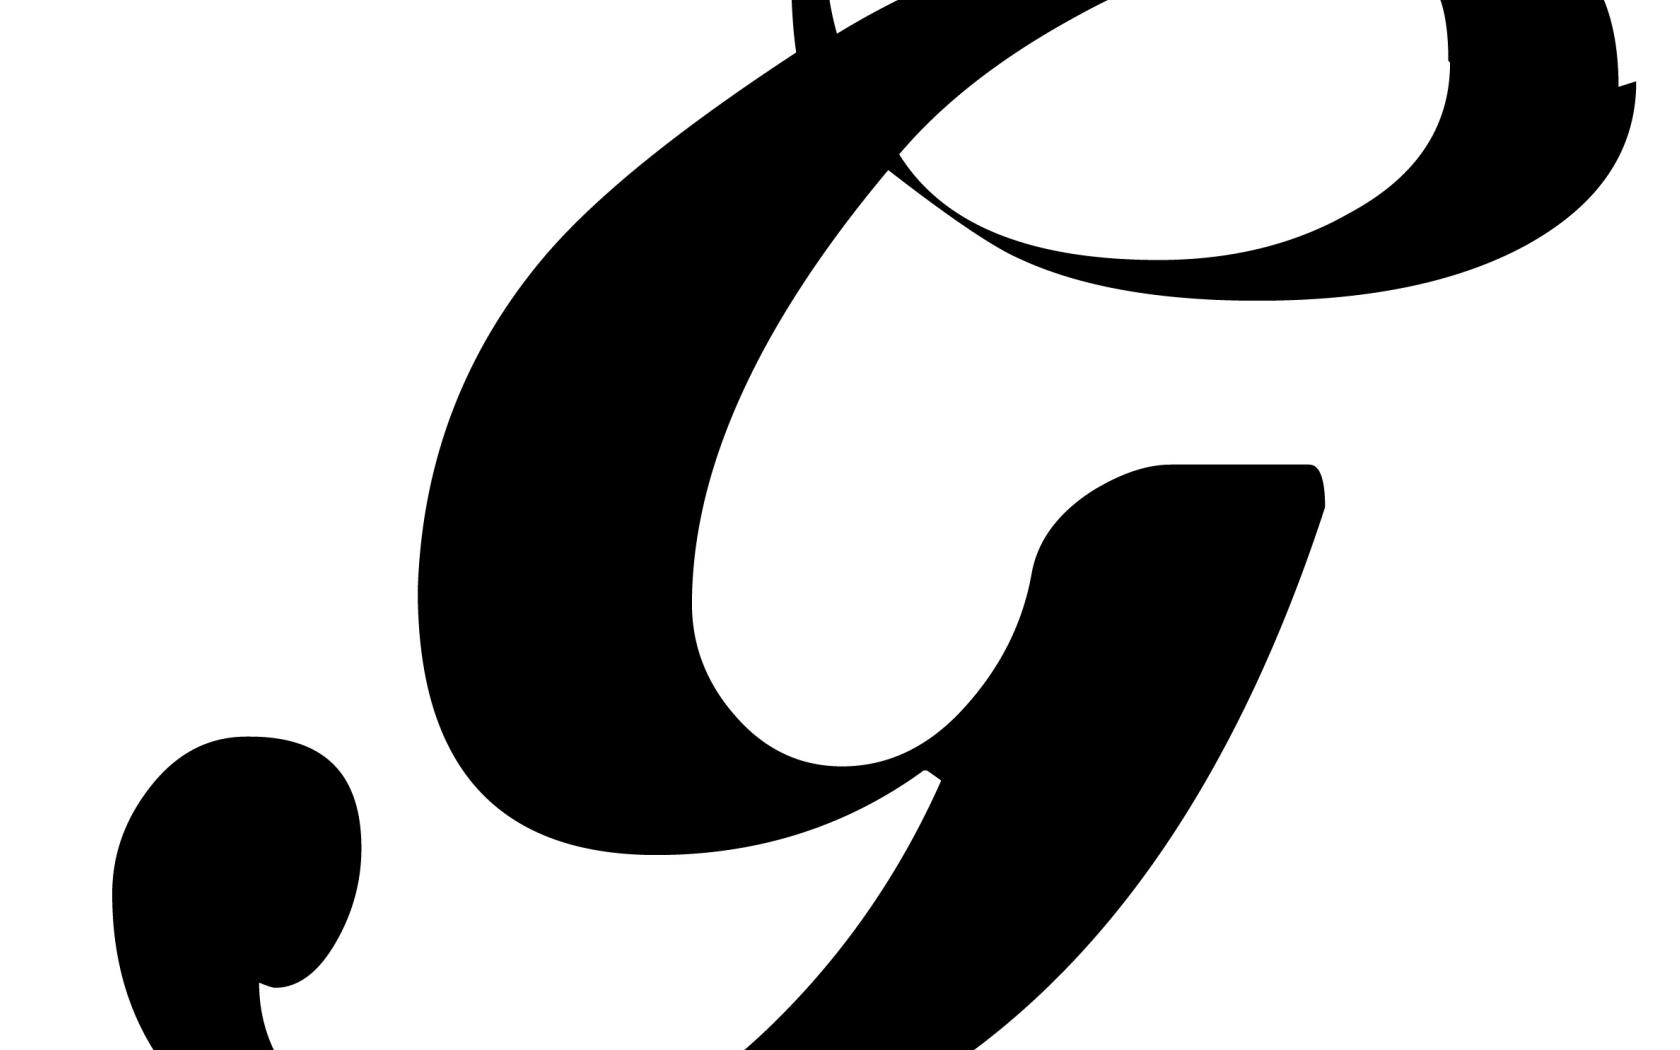 Unit Logo no2 by SiFreeX 1680x1050